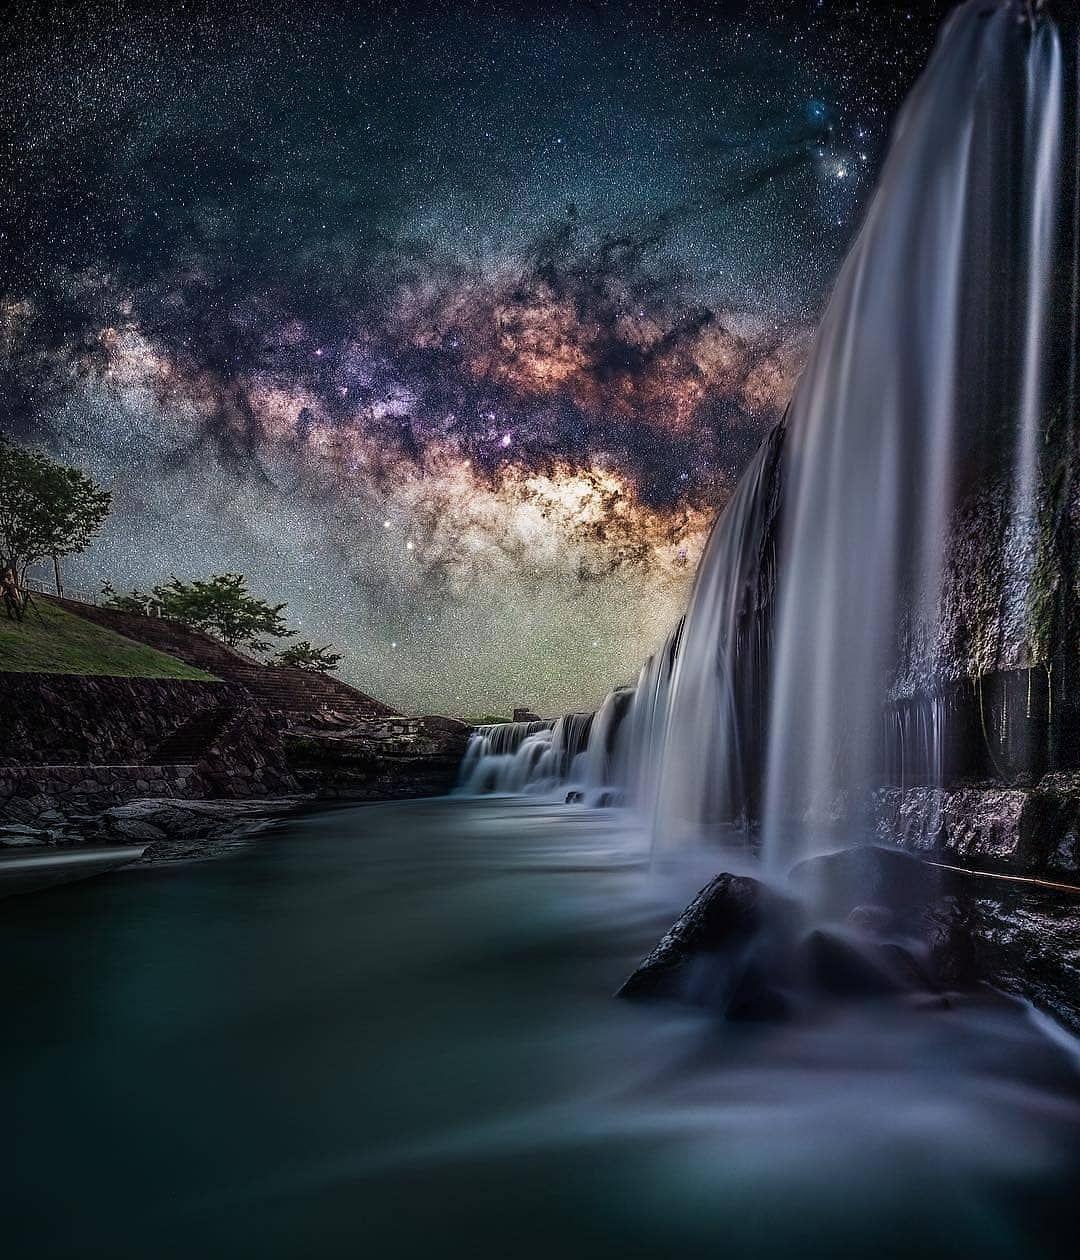 P R E S E N T I N G The Milkywayshoote Beautiful Night Sky Night Sky Photography Night Skies